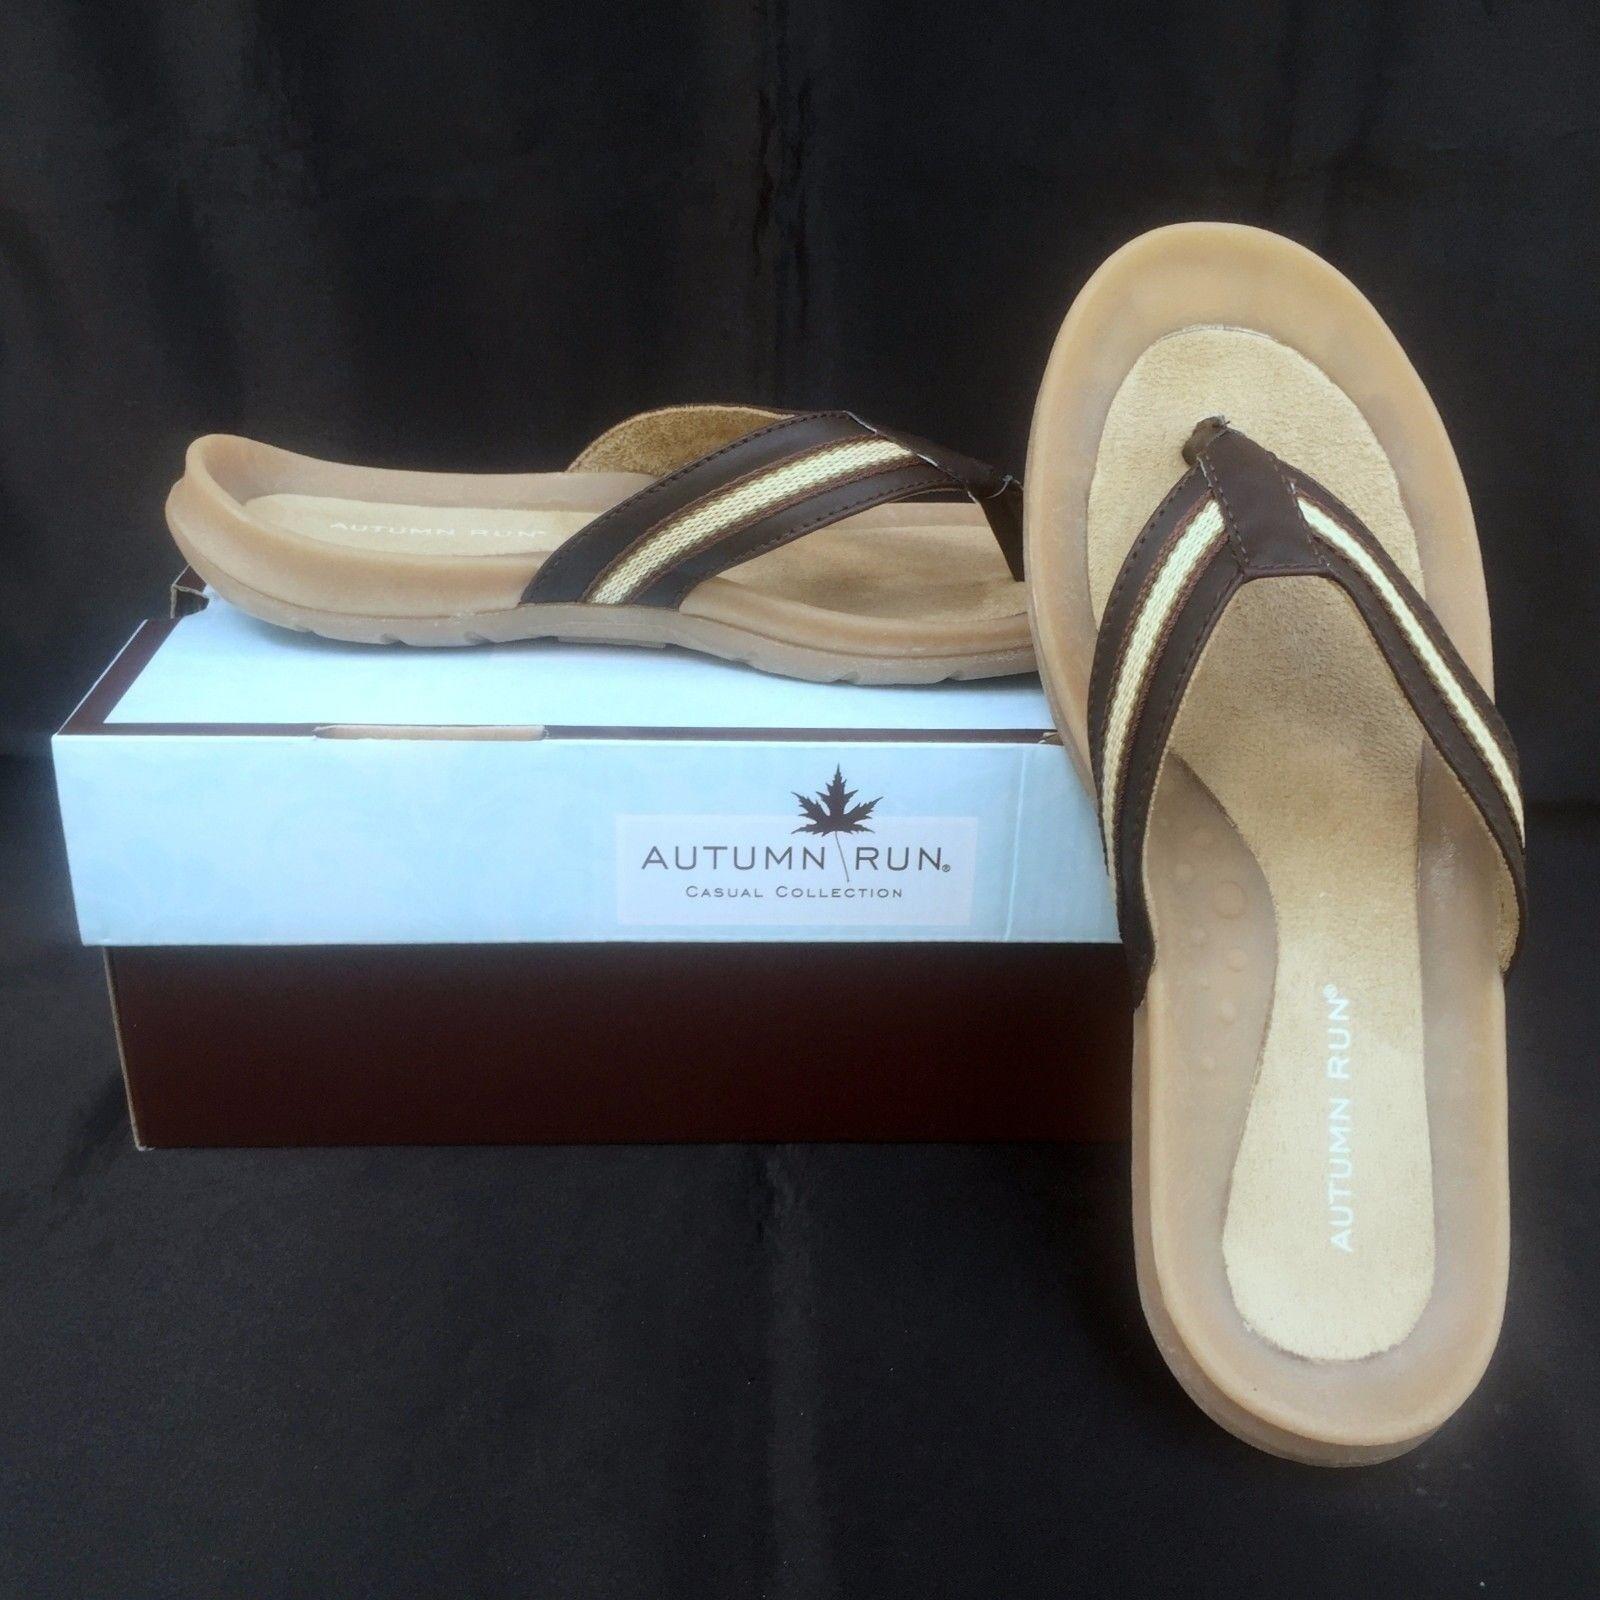 Autumn Run Debbie Size Flip Flop Sandals Womens Size Debbie 7 Brown Beige Thong 338b66